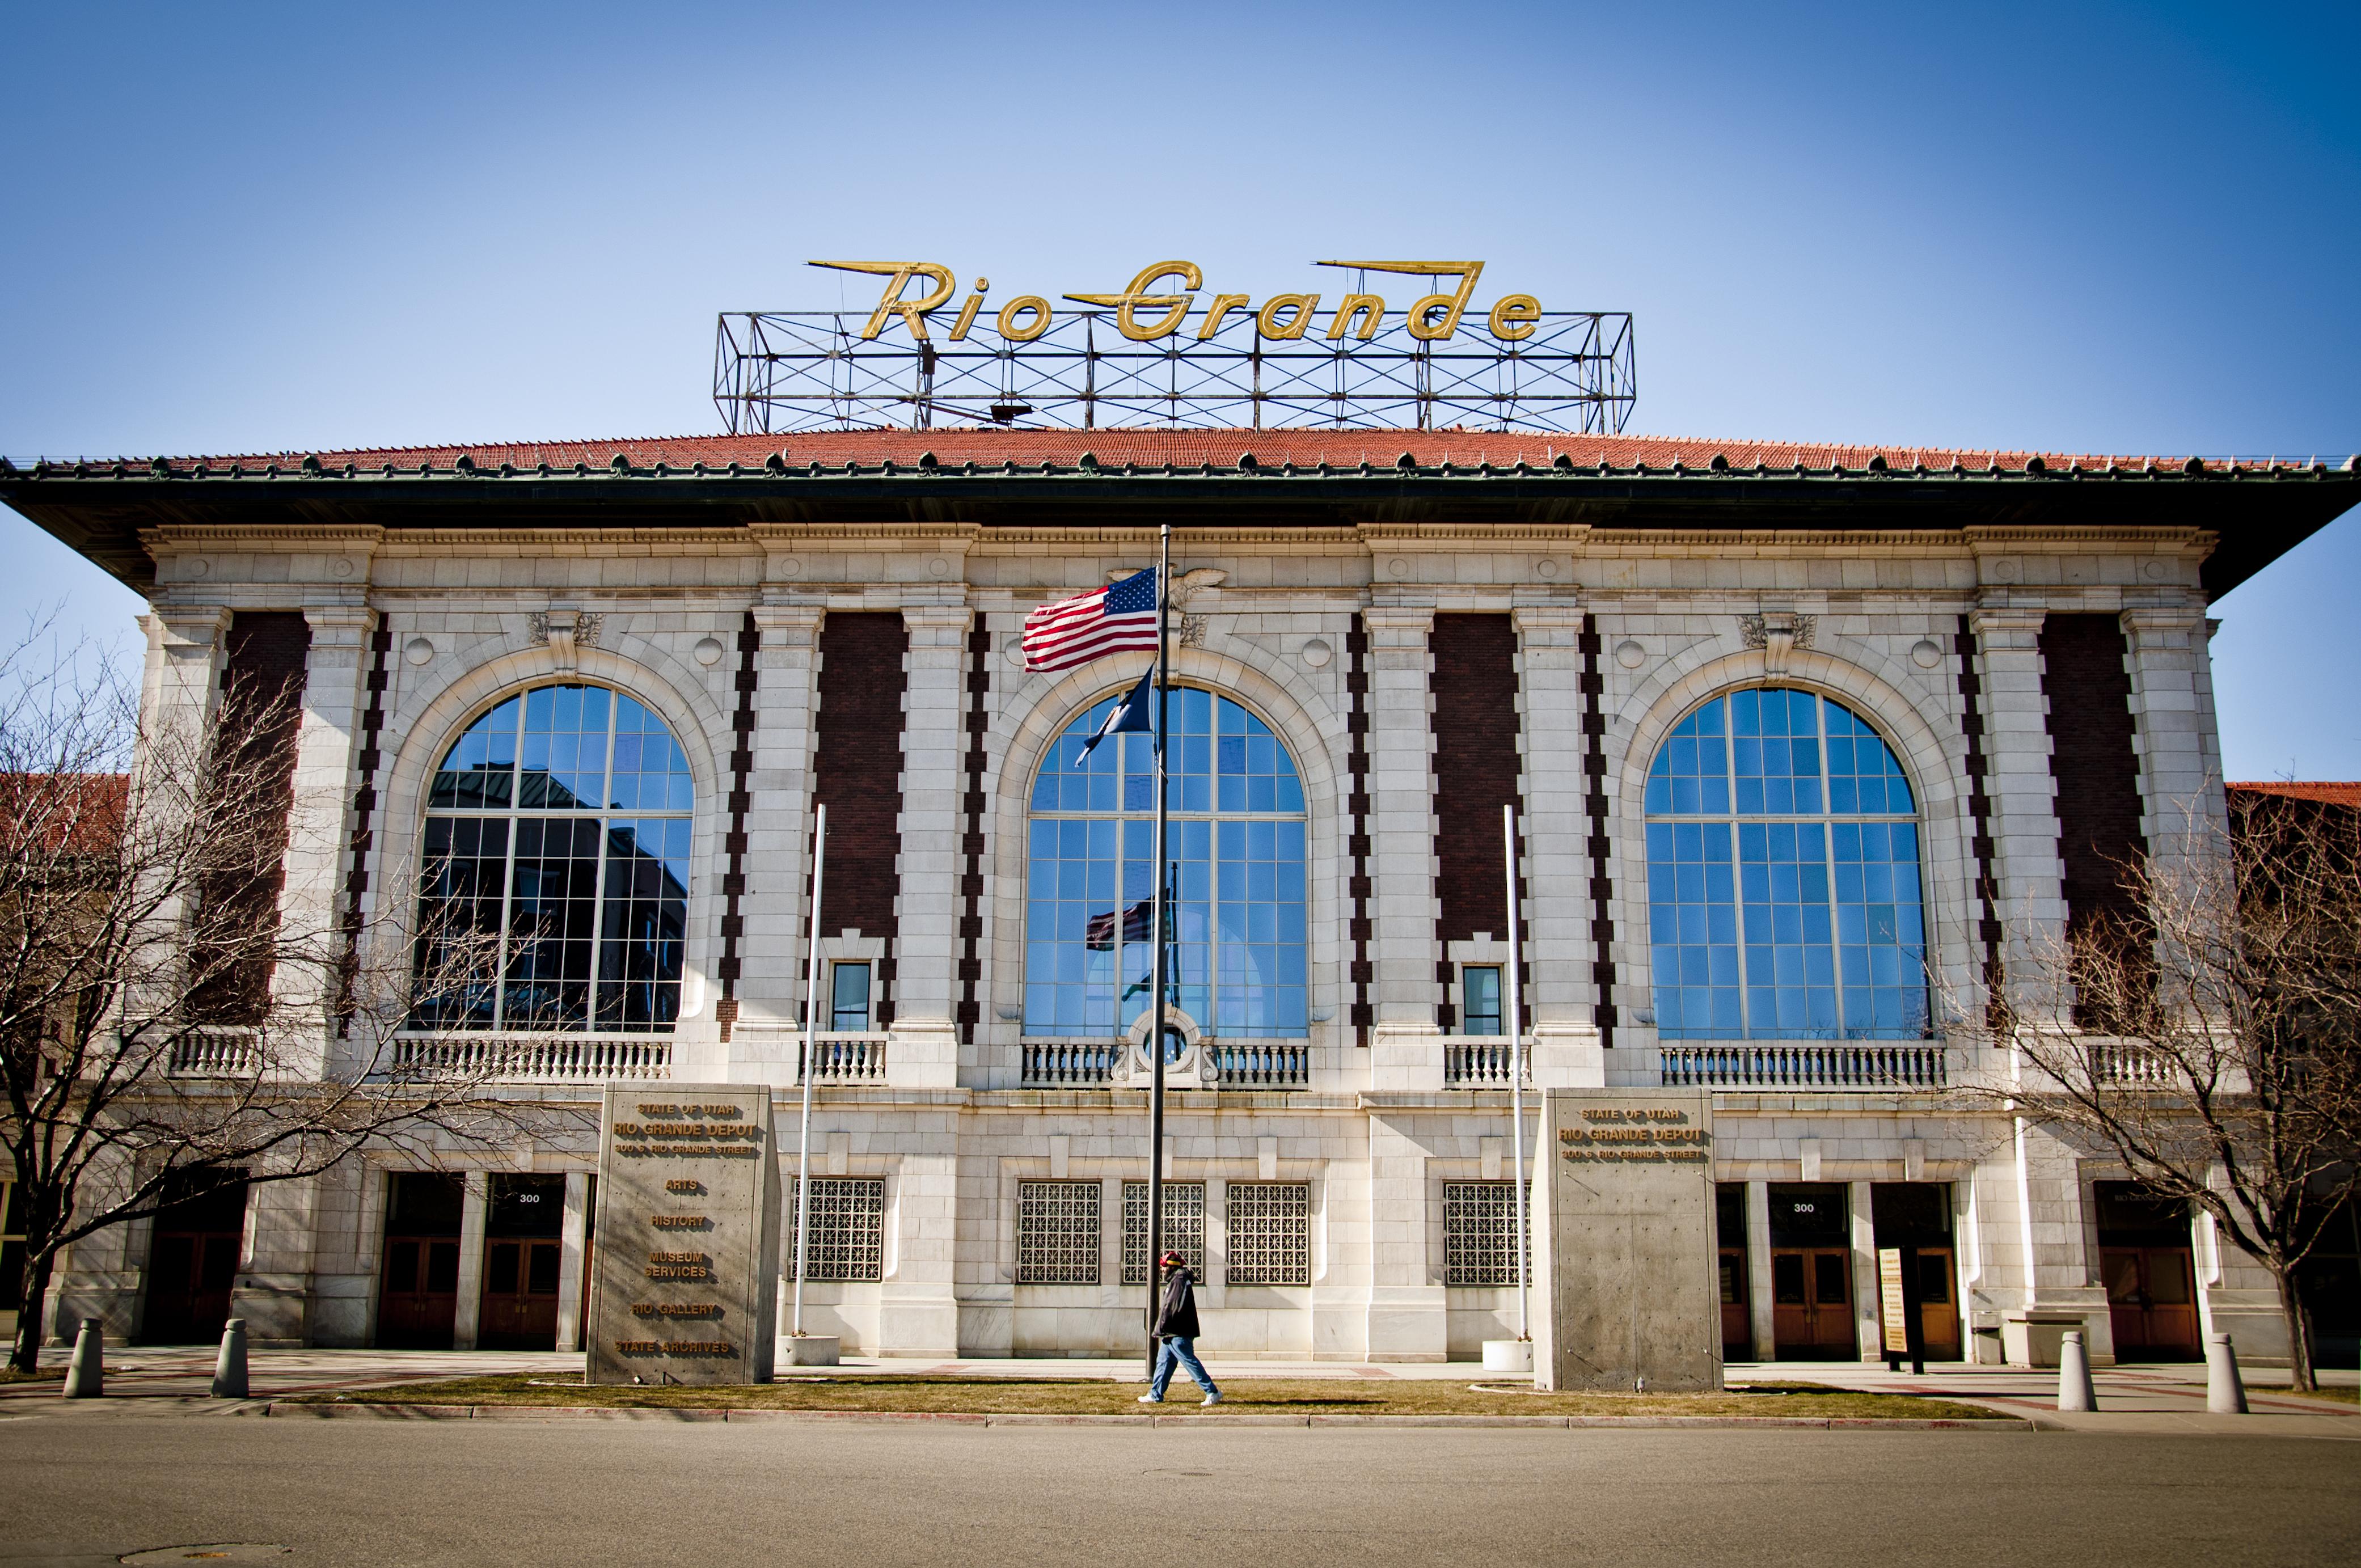 https://upload.wikimedia.org/wikipedia/commons/f/f0/Denver_%26_Rio_Grande_Western_Depot_in_SLC_-_Feb_3%2C_2011.jpg